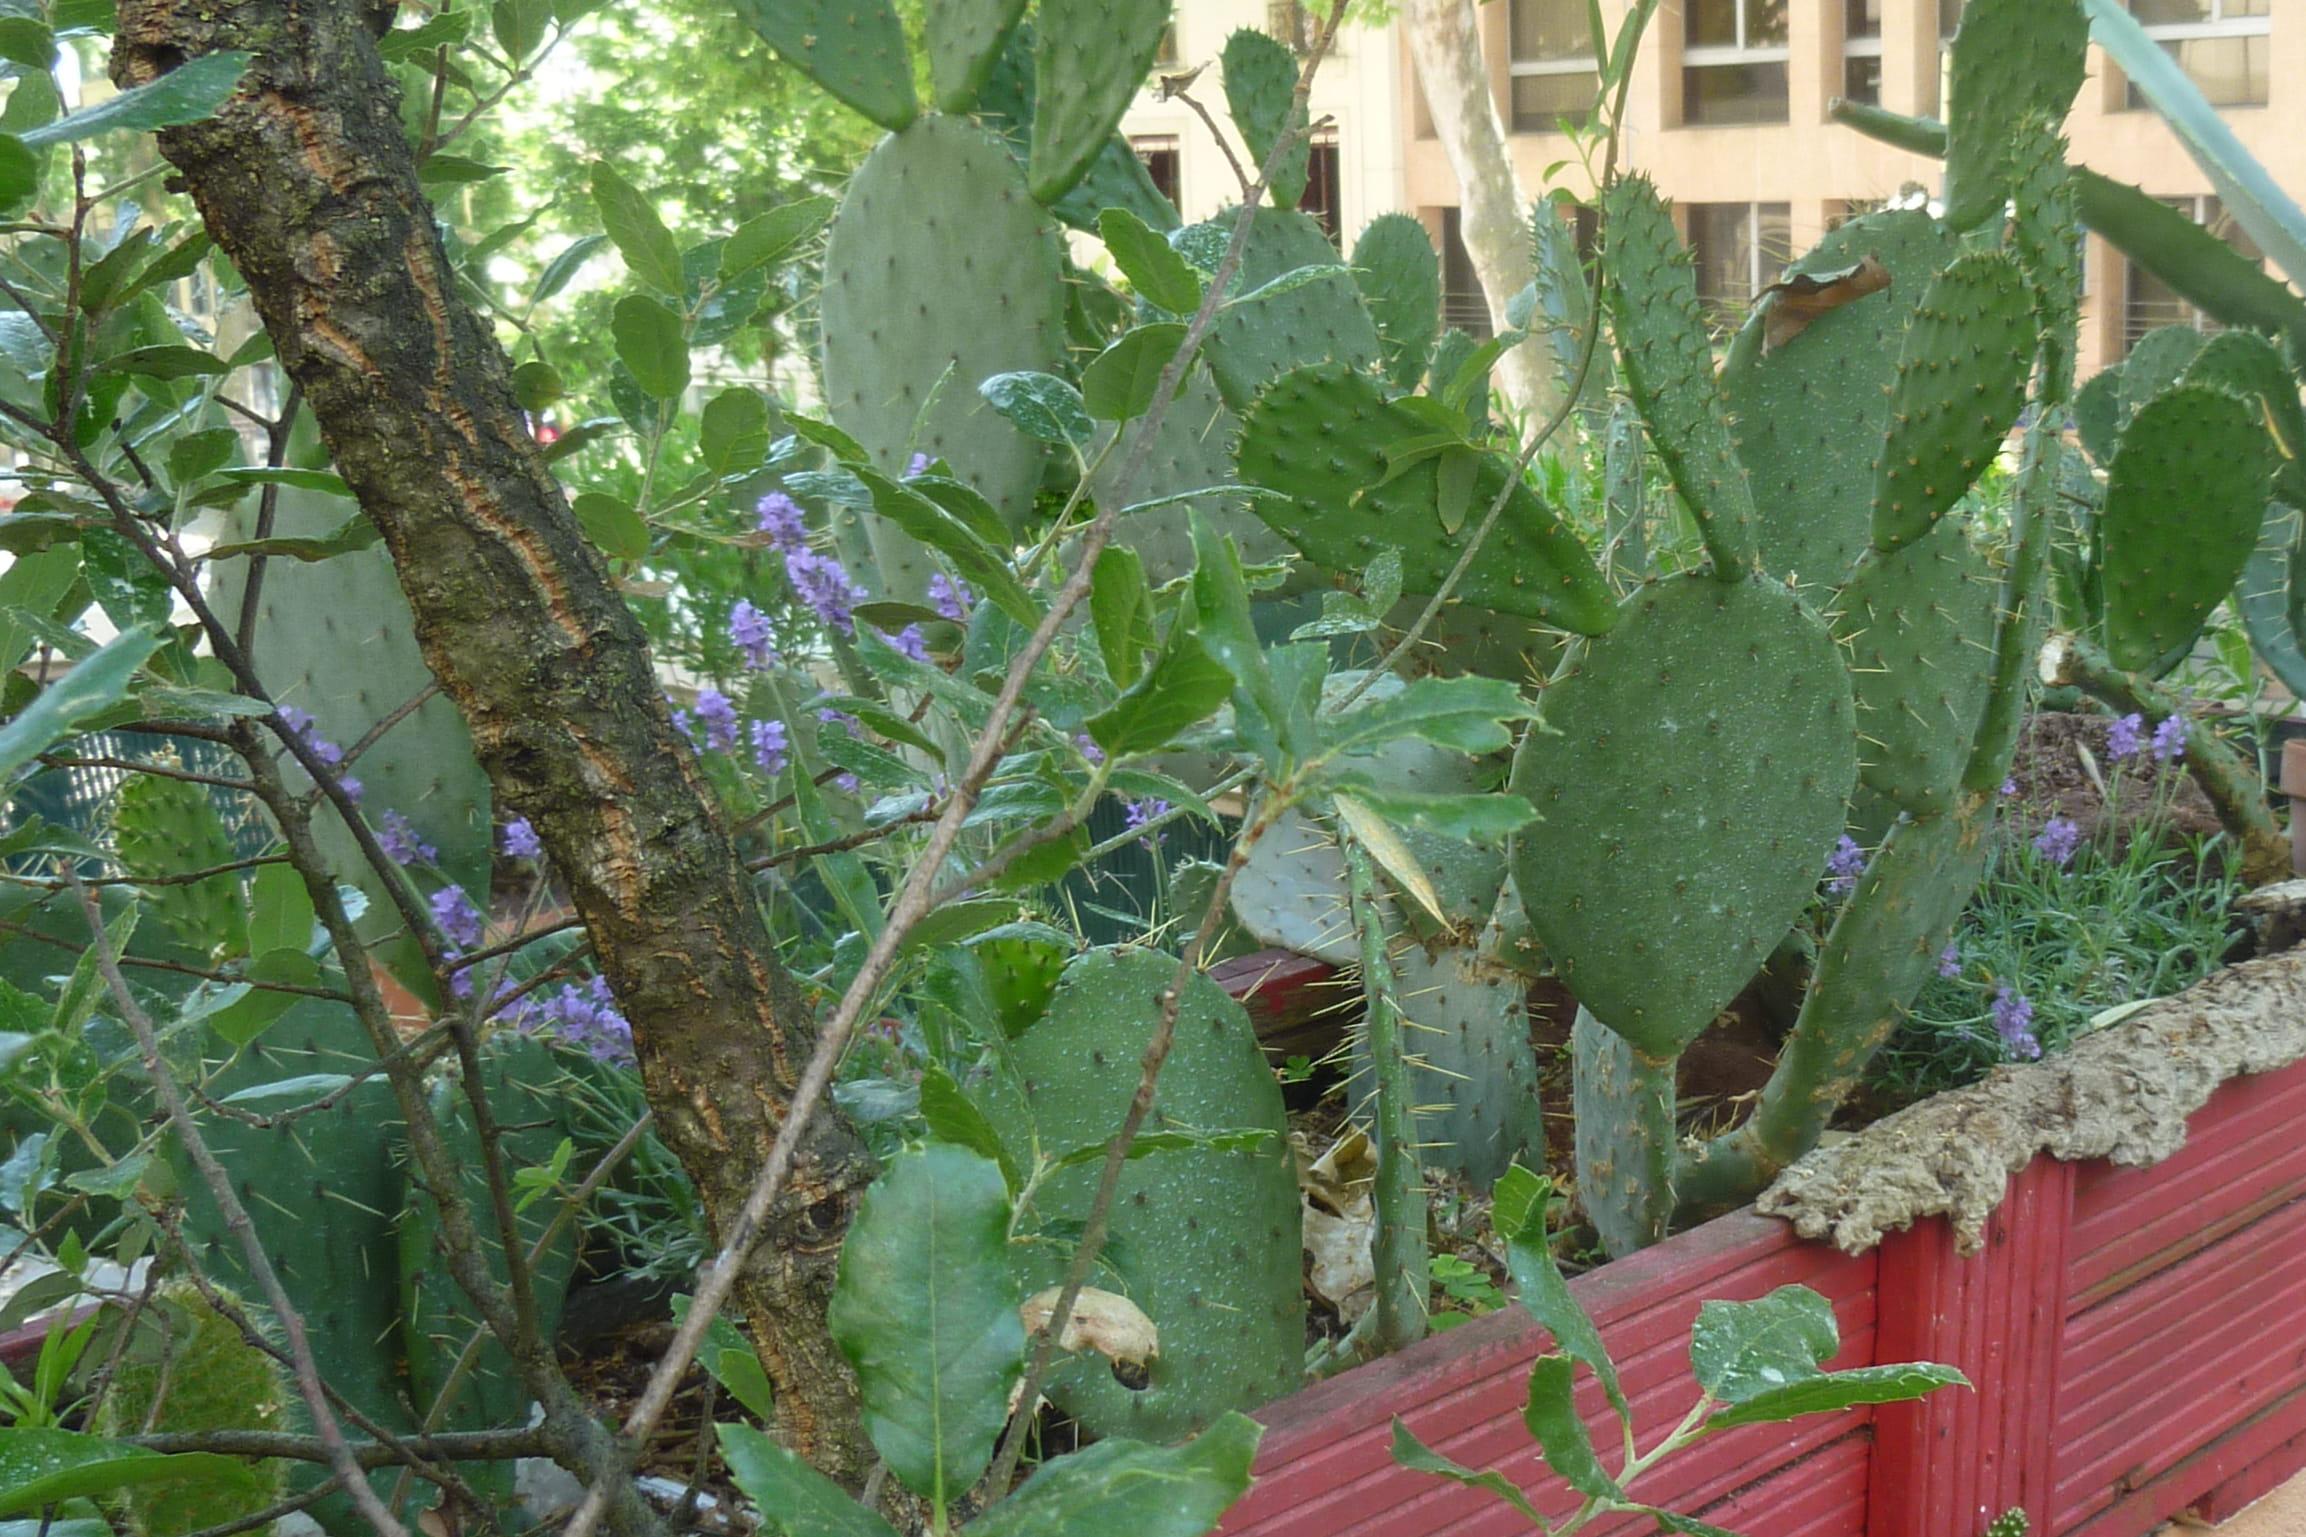 Les plantes grasses plantation et bouturage journal des femmes for Plantation jardin